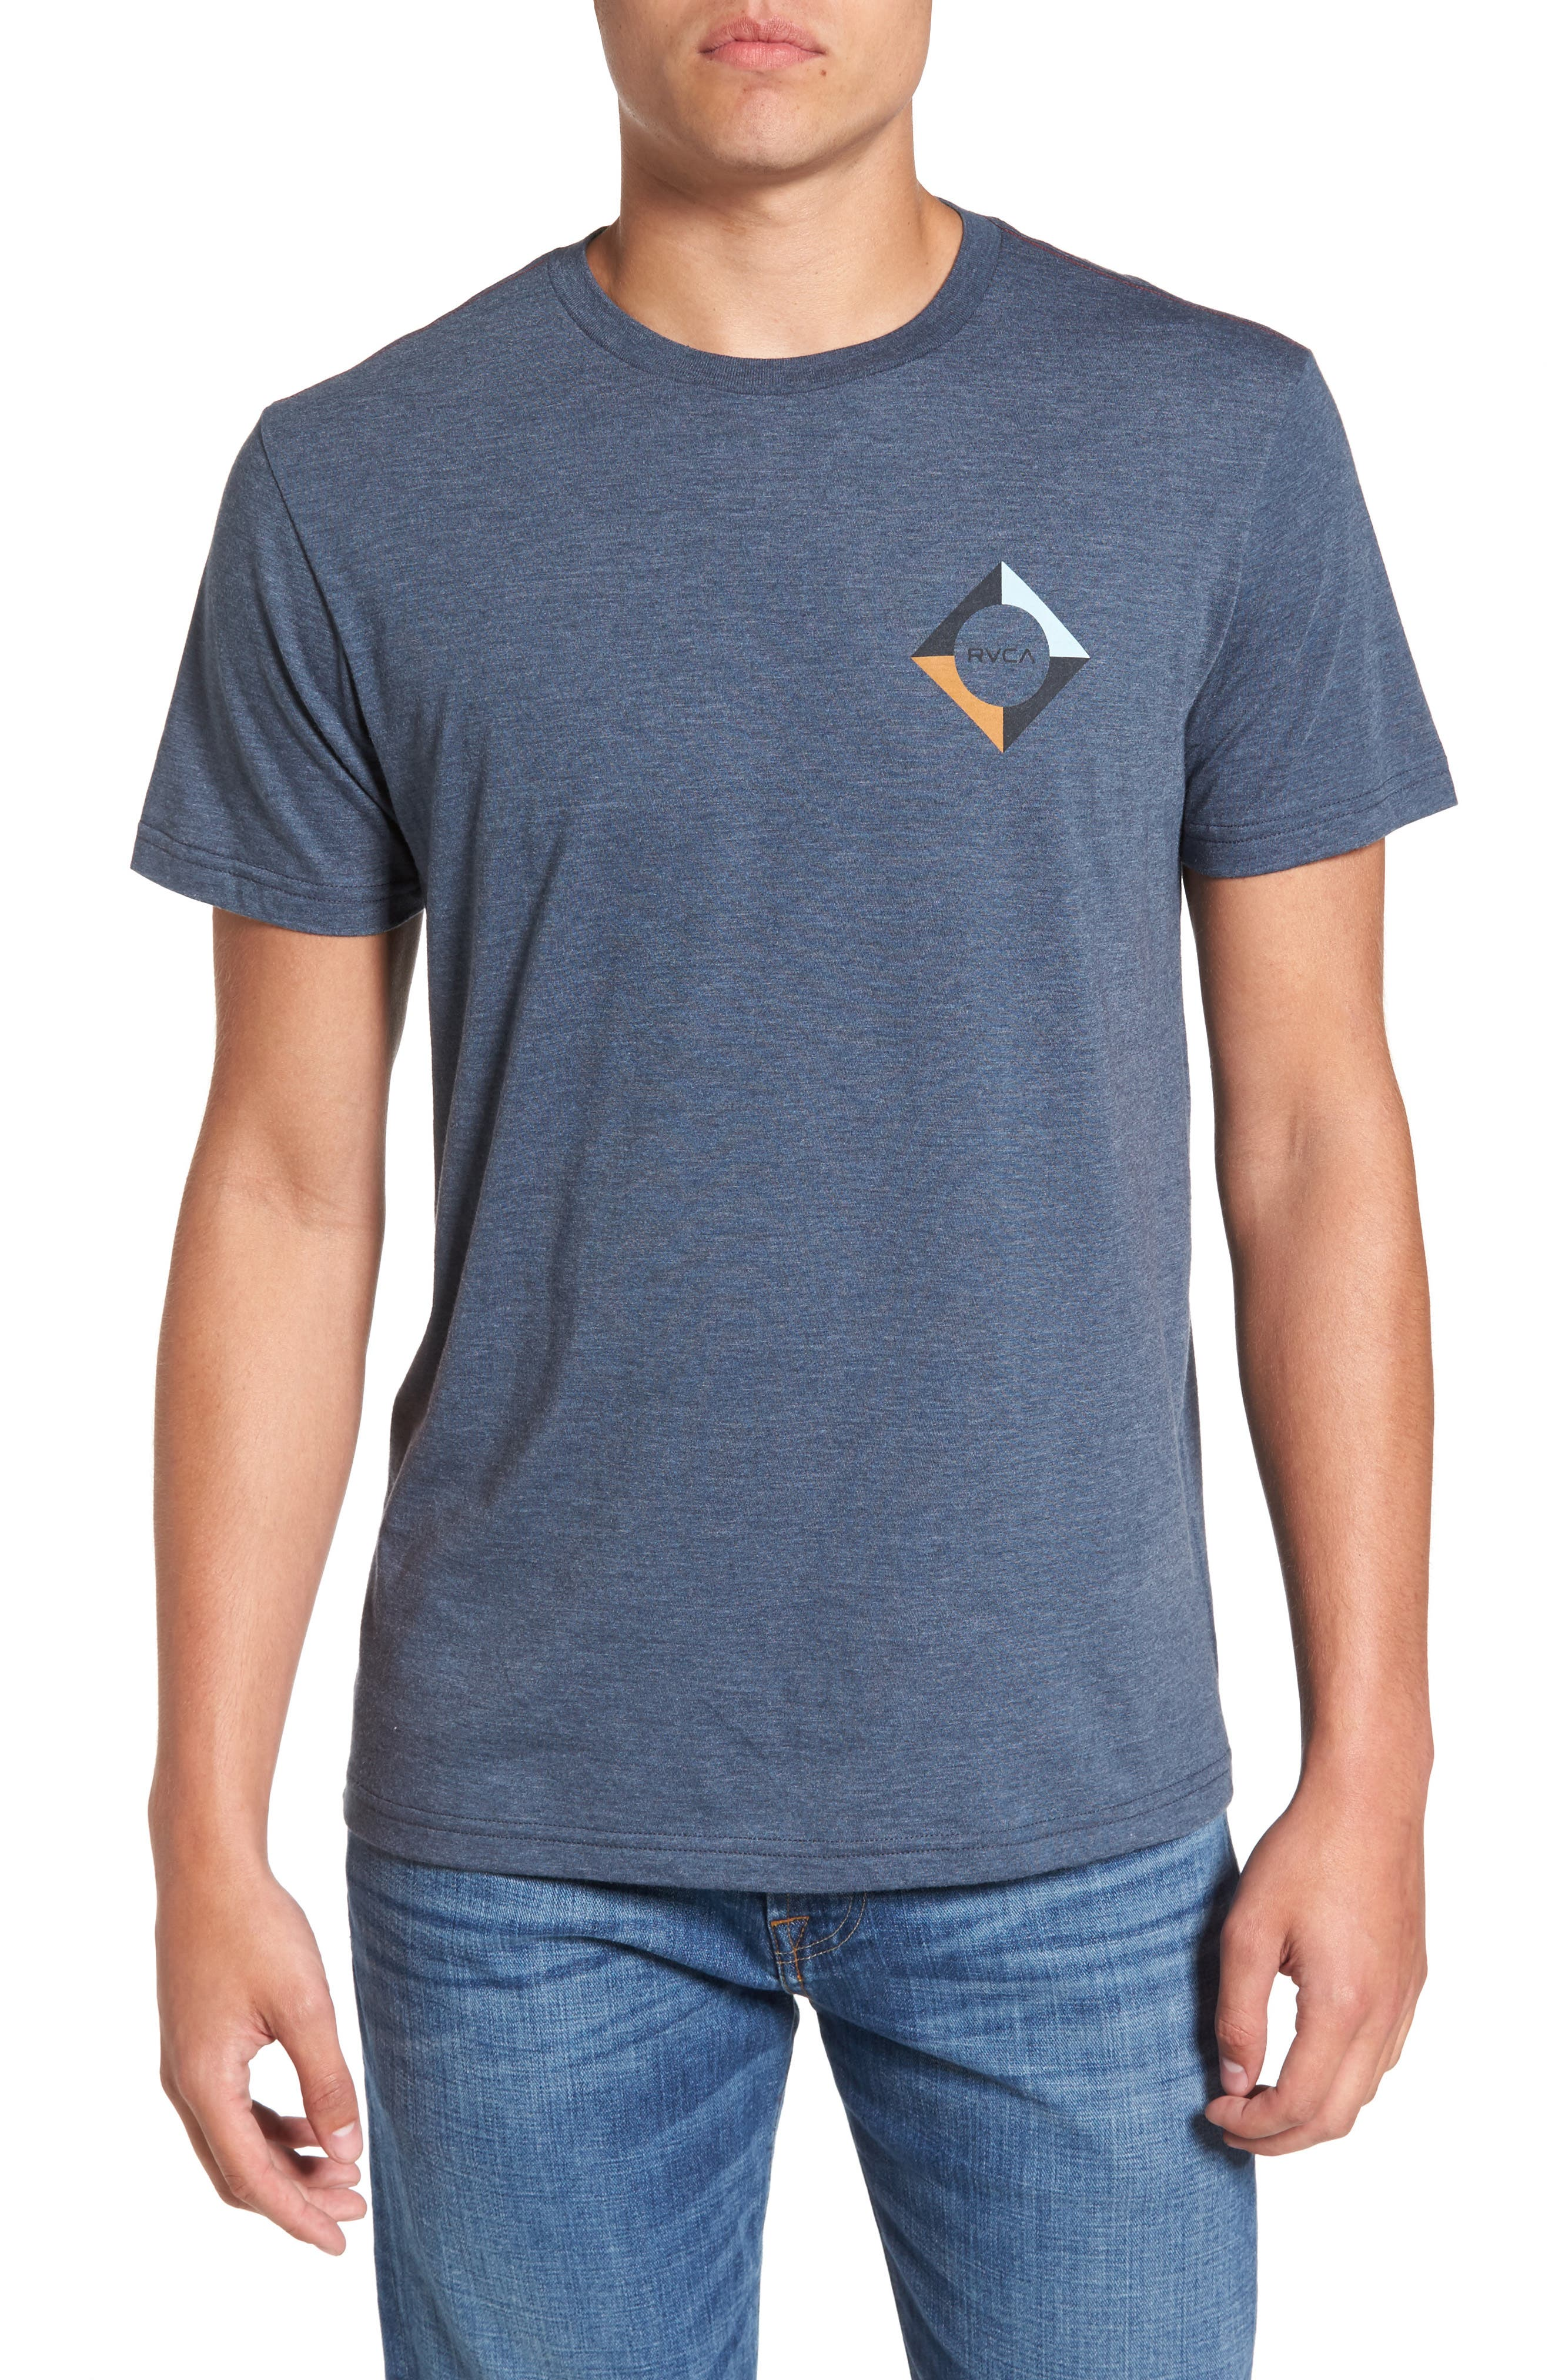 RVCA Basic Box 90 Graphic T-Shirt